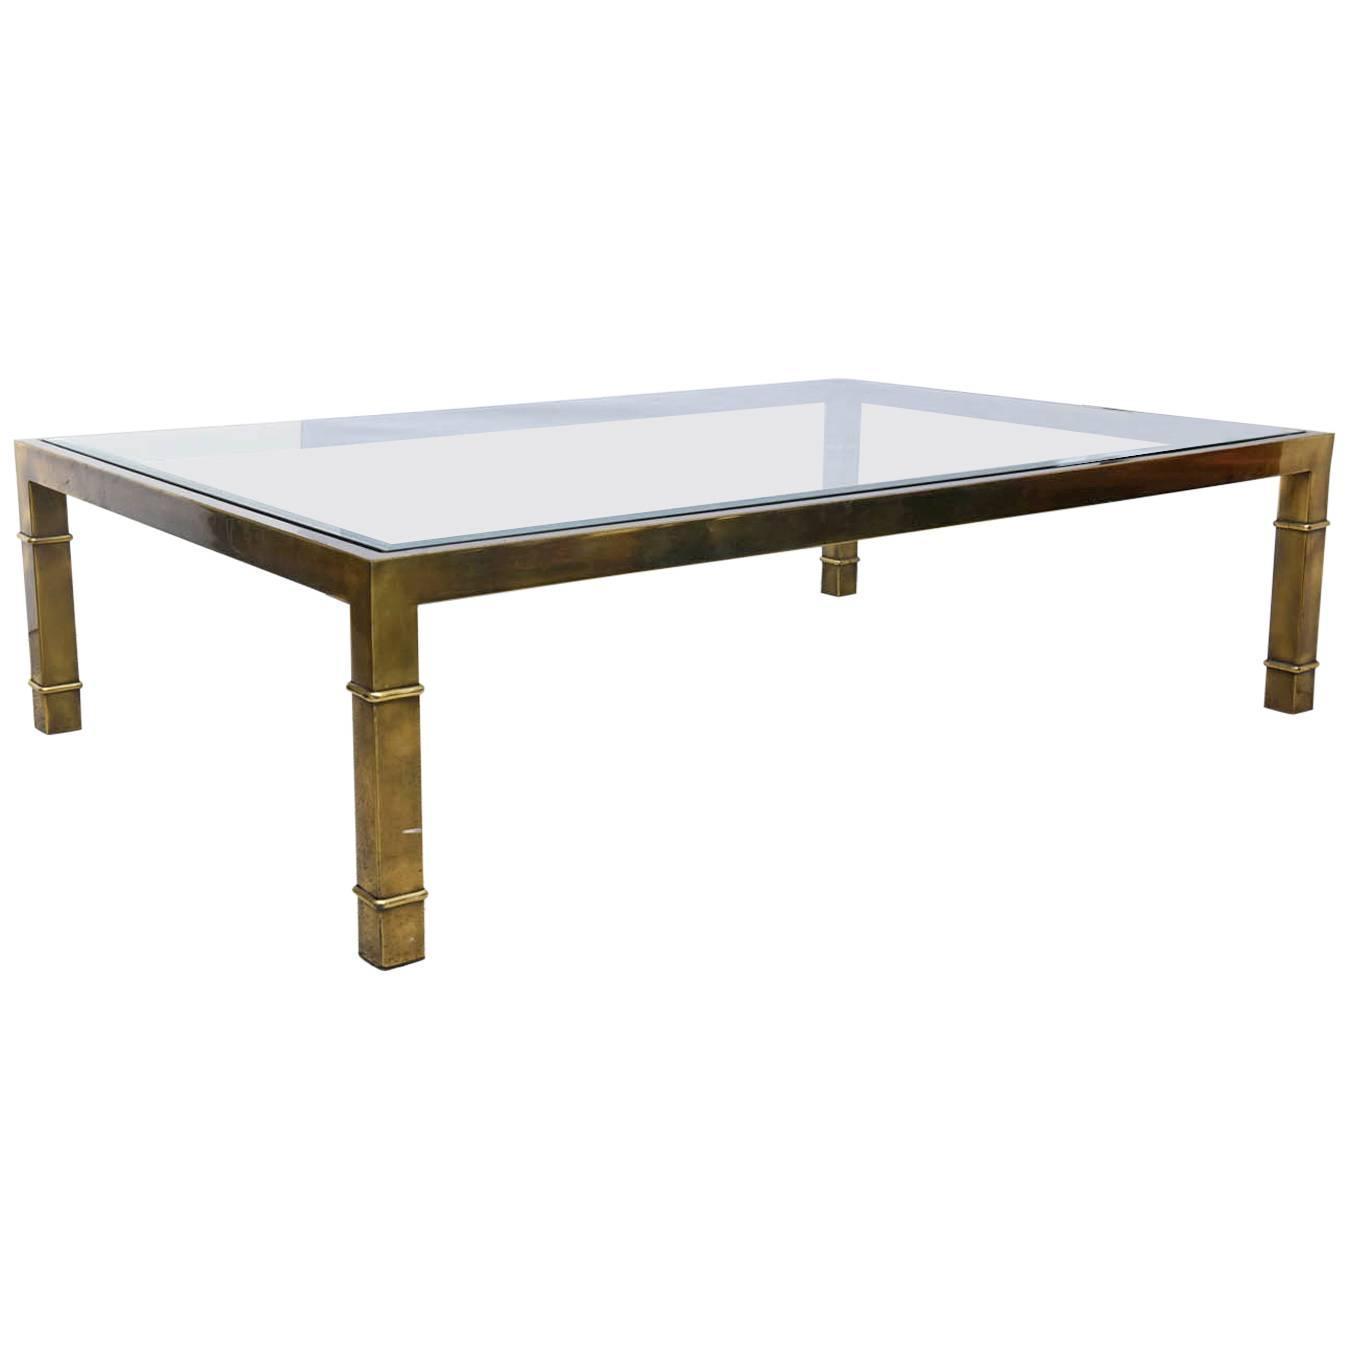 Custom Brass Coffee Table: Custom Monumental Brass Coffee Table By Mastercraft, USA